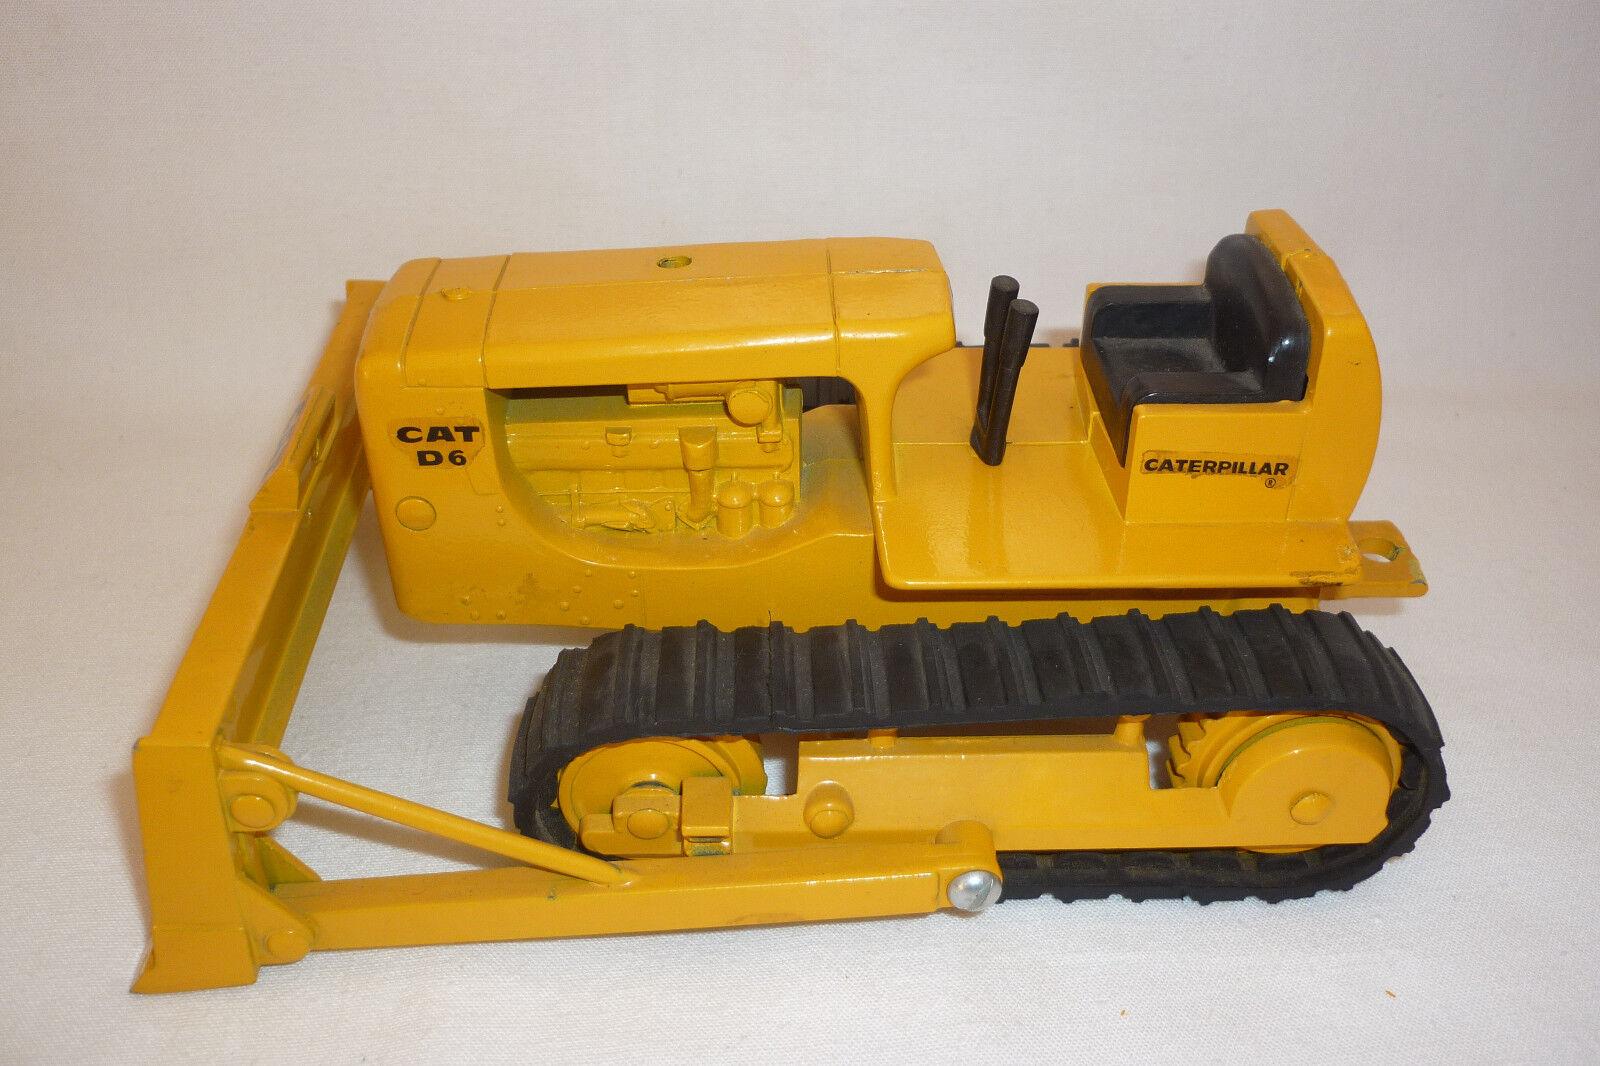 Ertl-metal modelo-caterpillar d 6-Bulldozer - 1 24 - (7.bm-172)